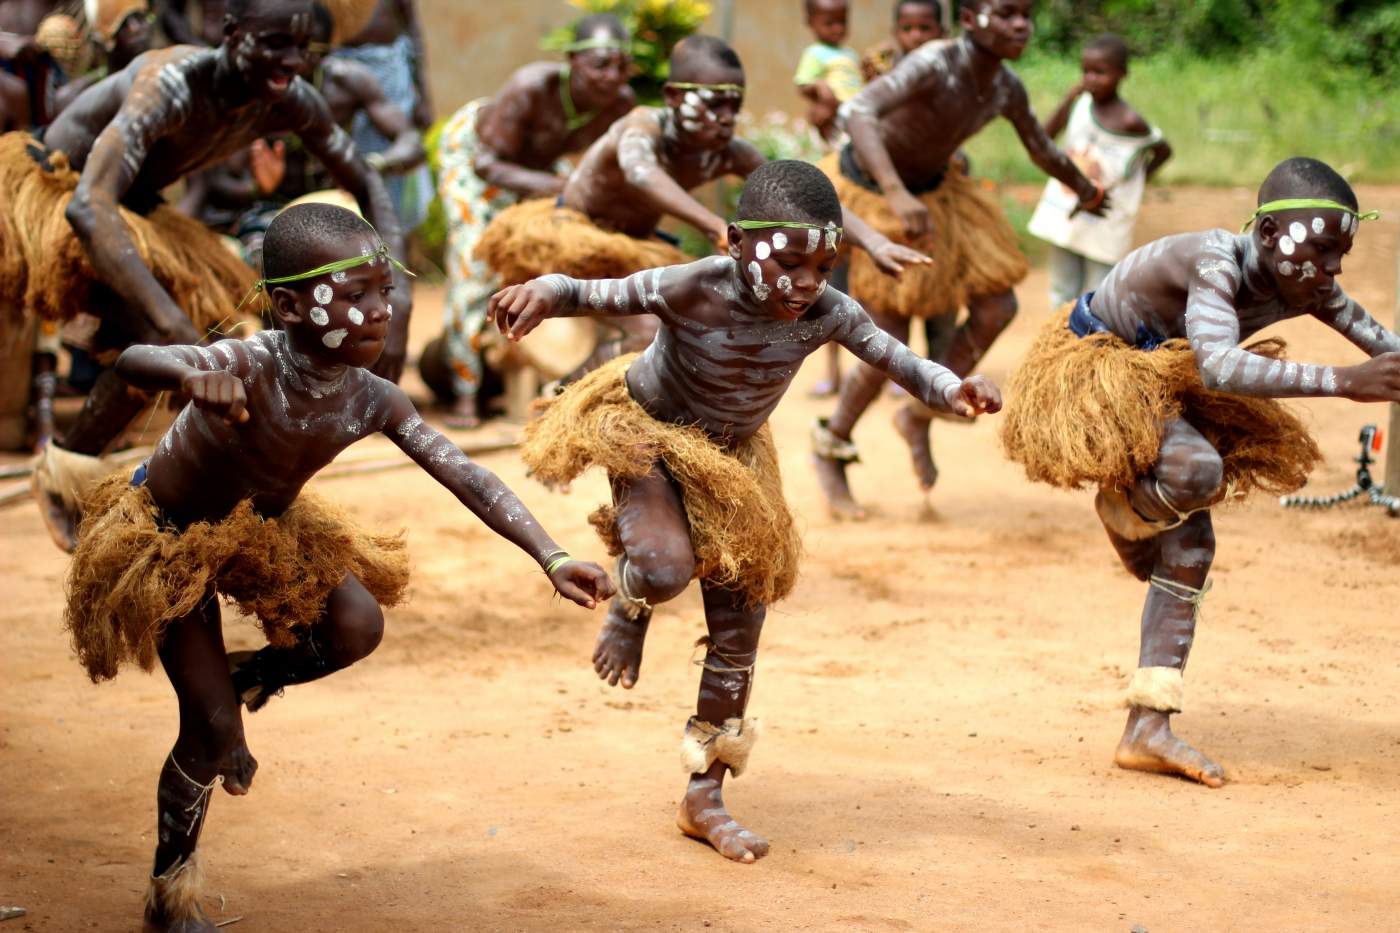 kakaoplantagen in afrika